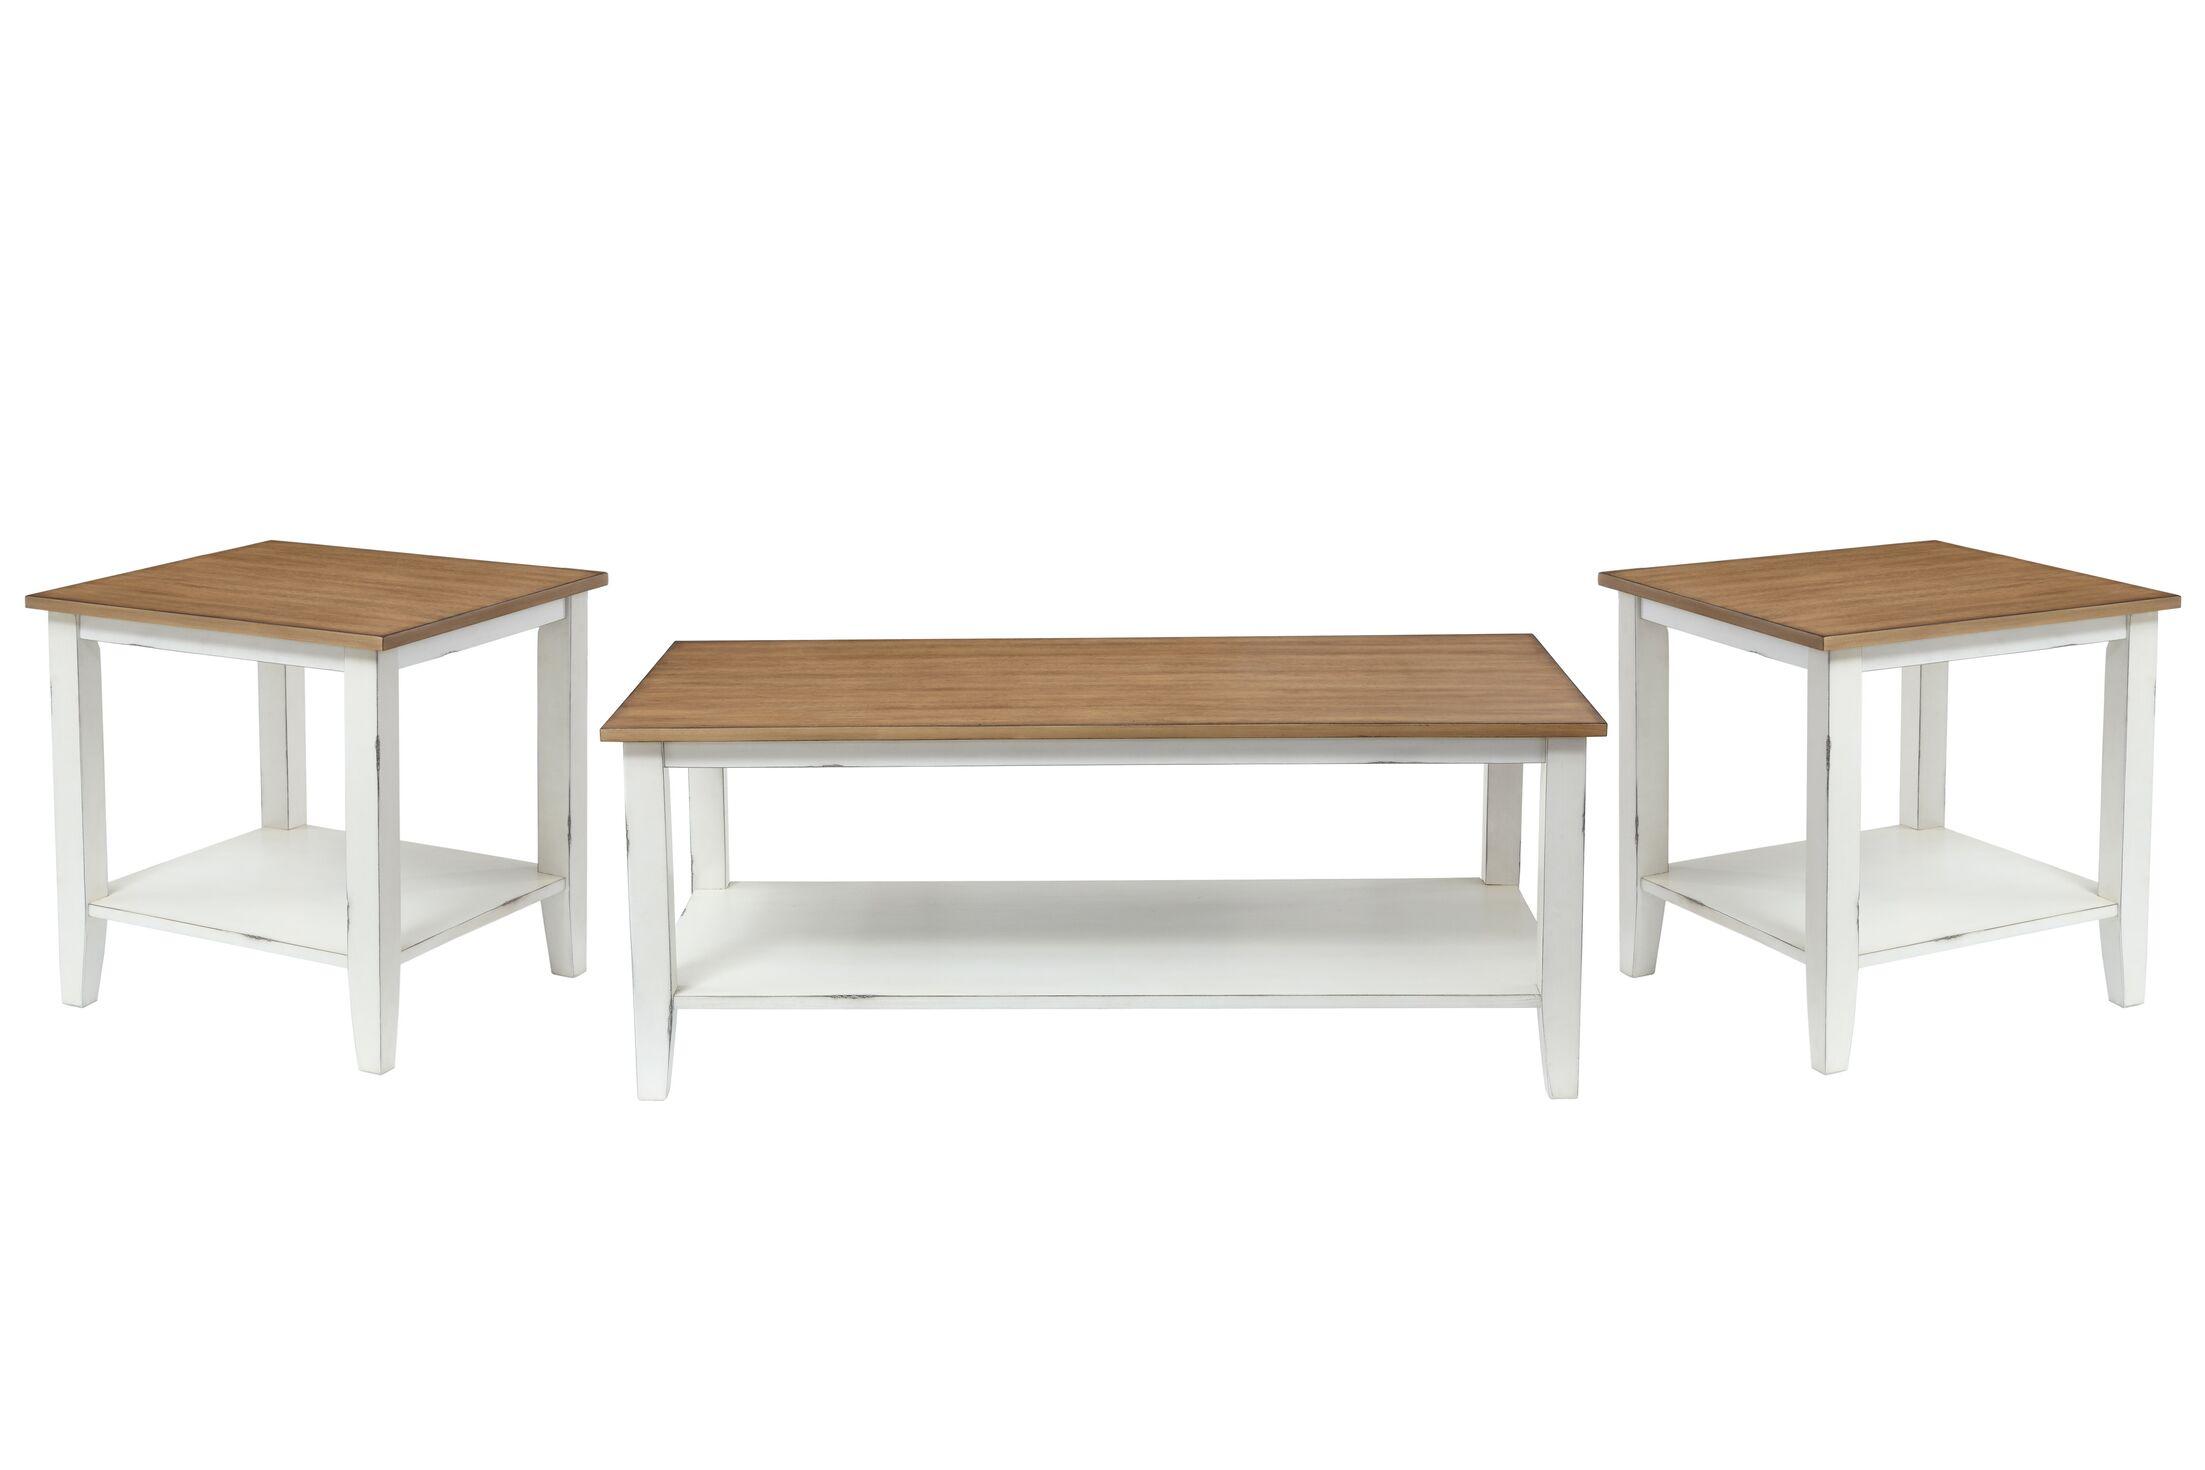 Funkhouser 3 Piece Coffee Table Set